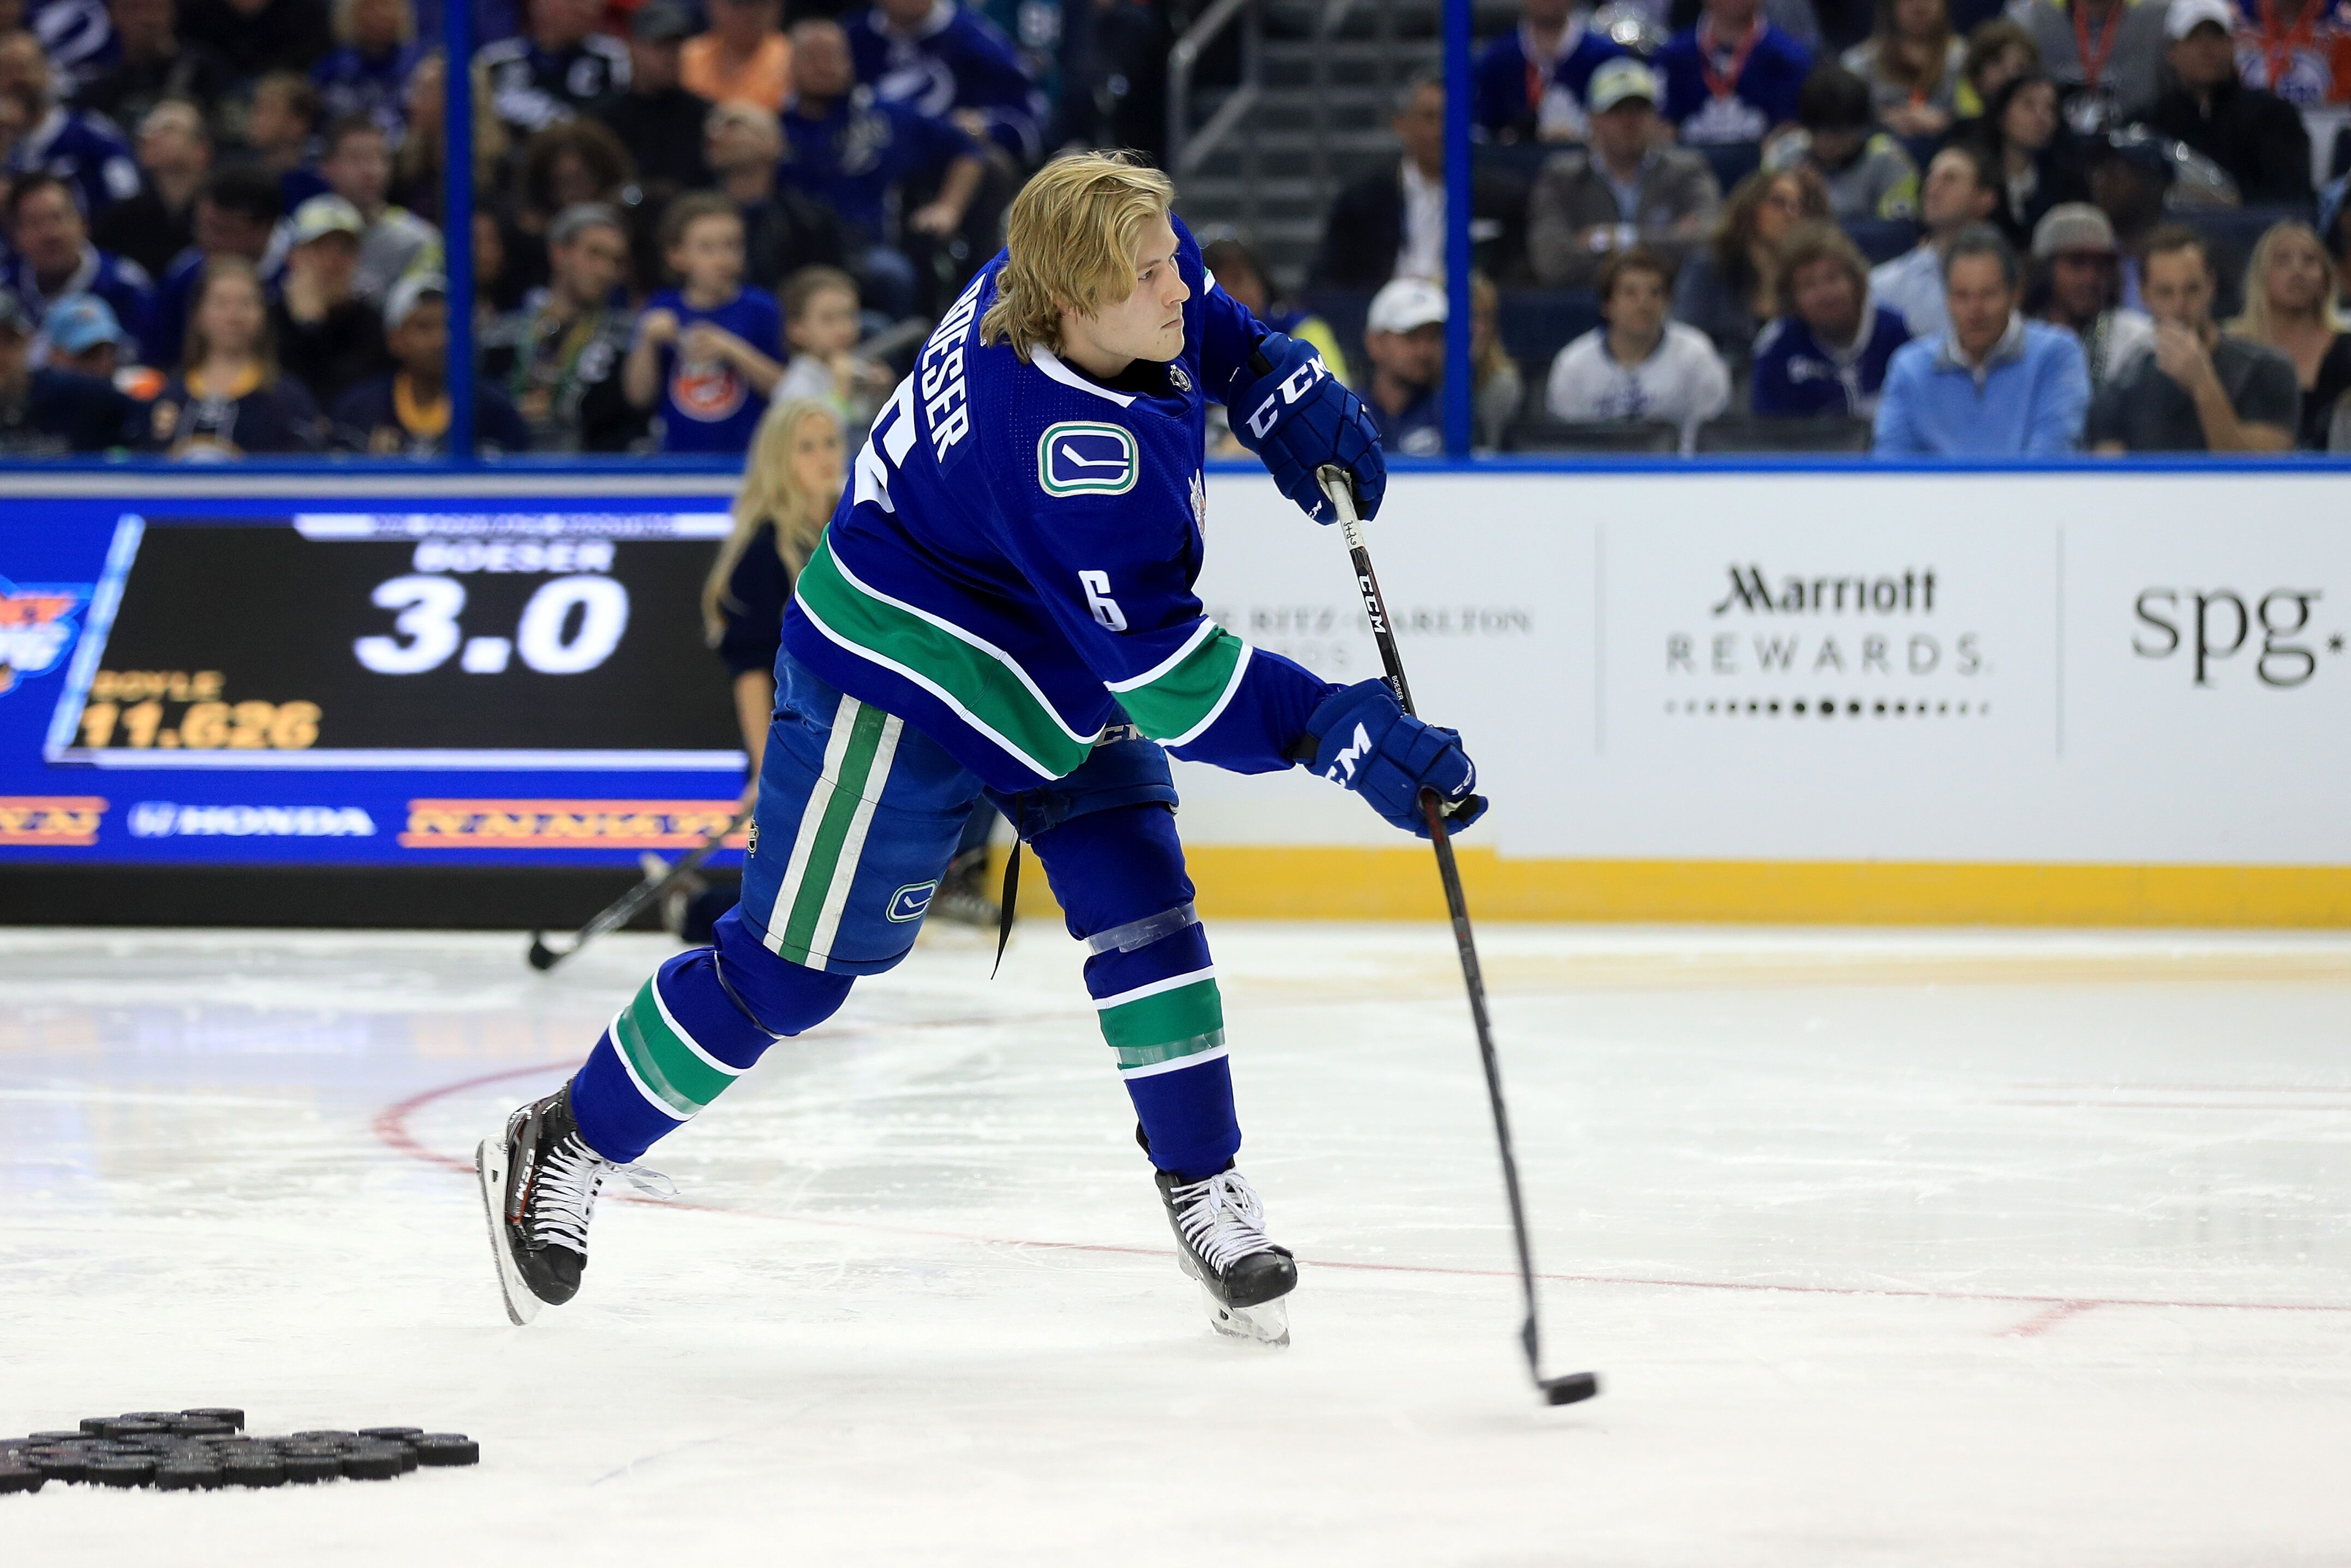 c05736a40 Vancouver Canucks: Brock Boeser Wins 2018 NHL All-Star Game MVP